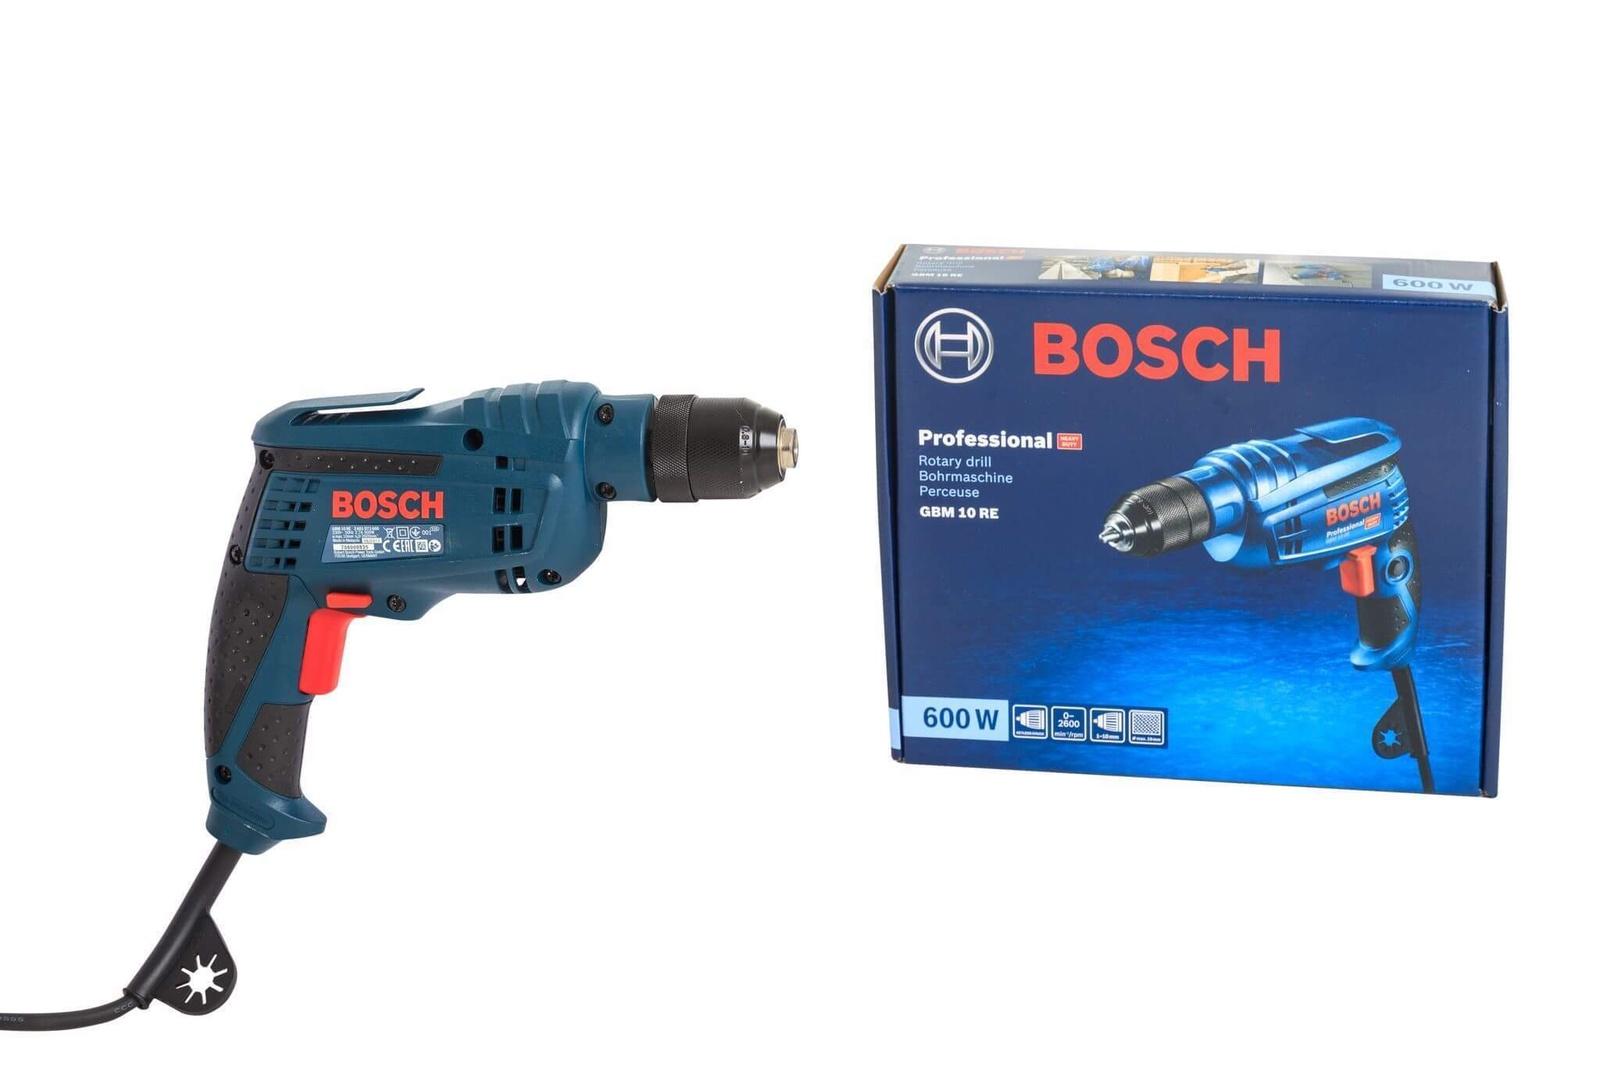 Дрель-шуруповерт Bosch  GBM 10 RE, 0.601.473.600